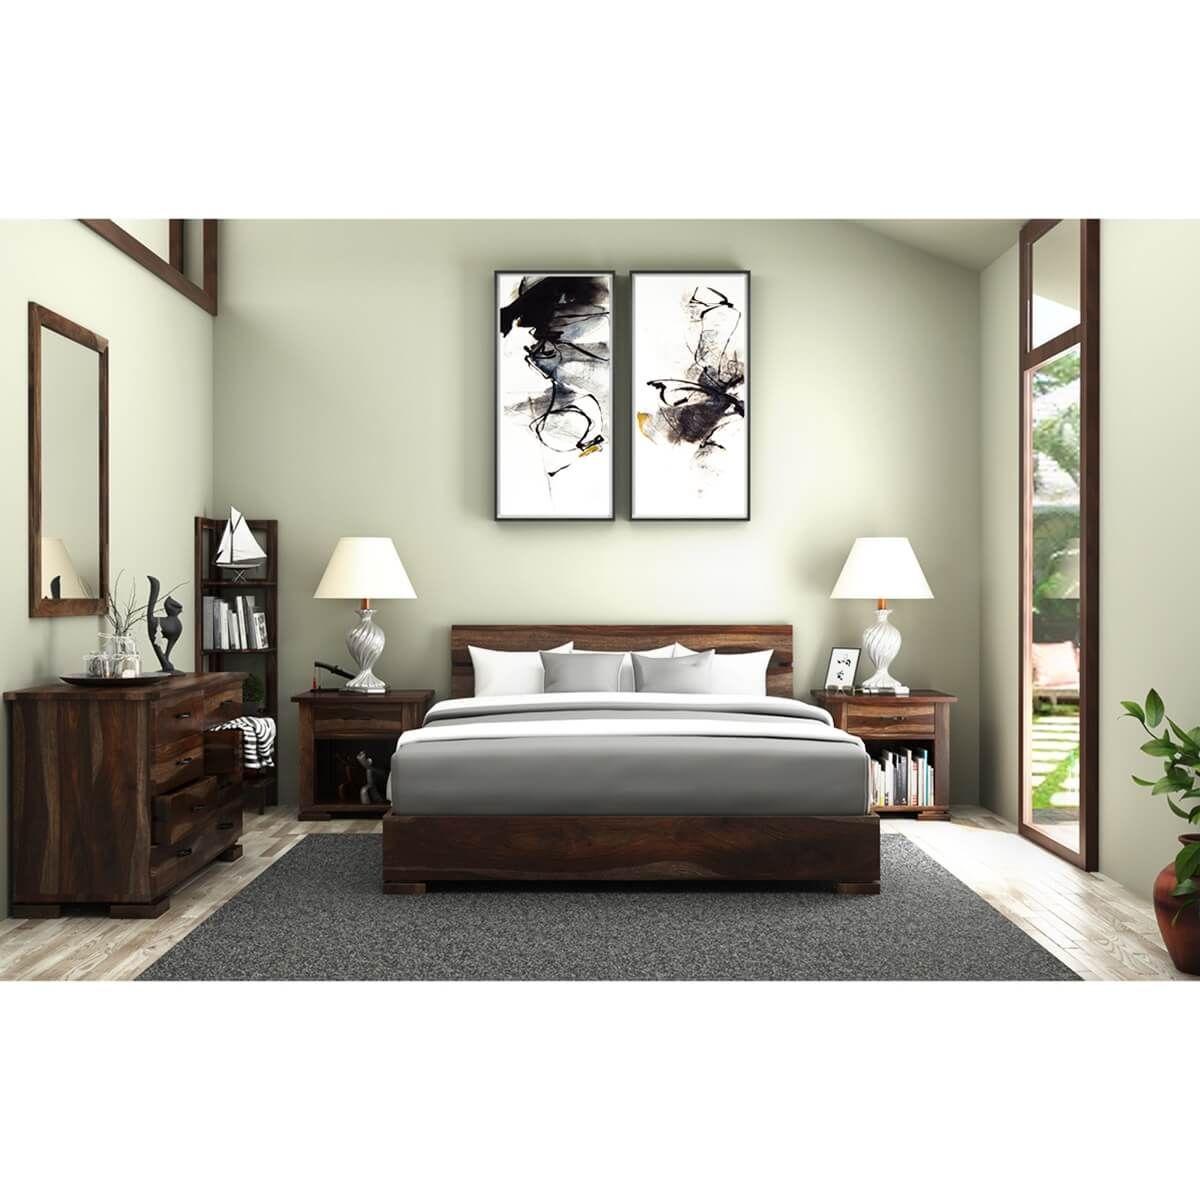 Athena Full Size Platform Bed 5 Piece Solid Wood Bedroom ...